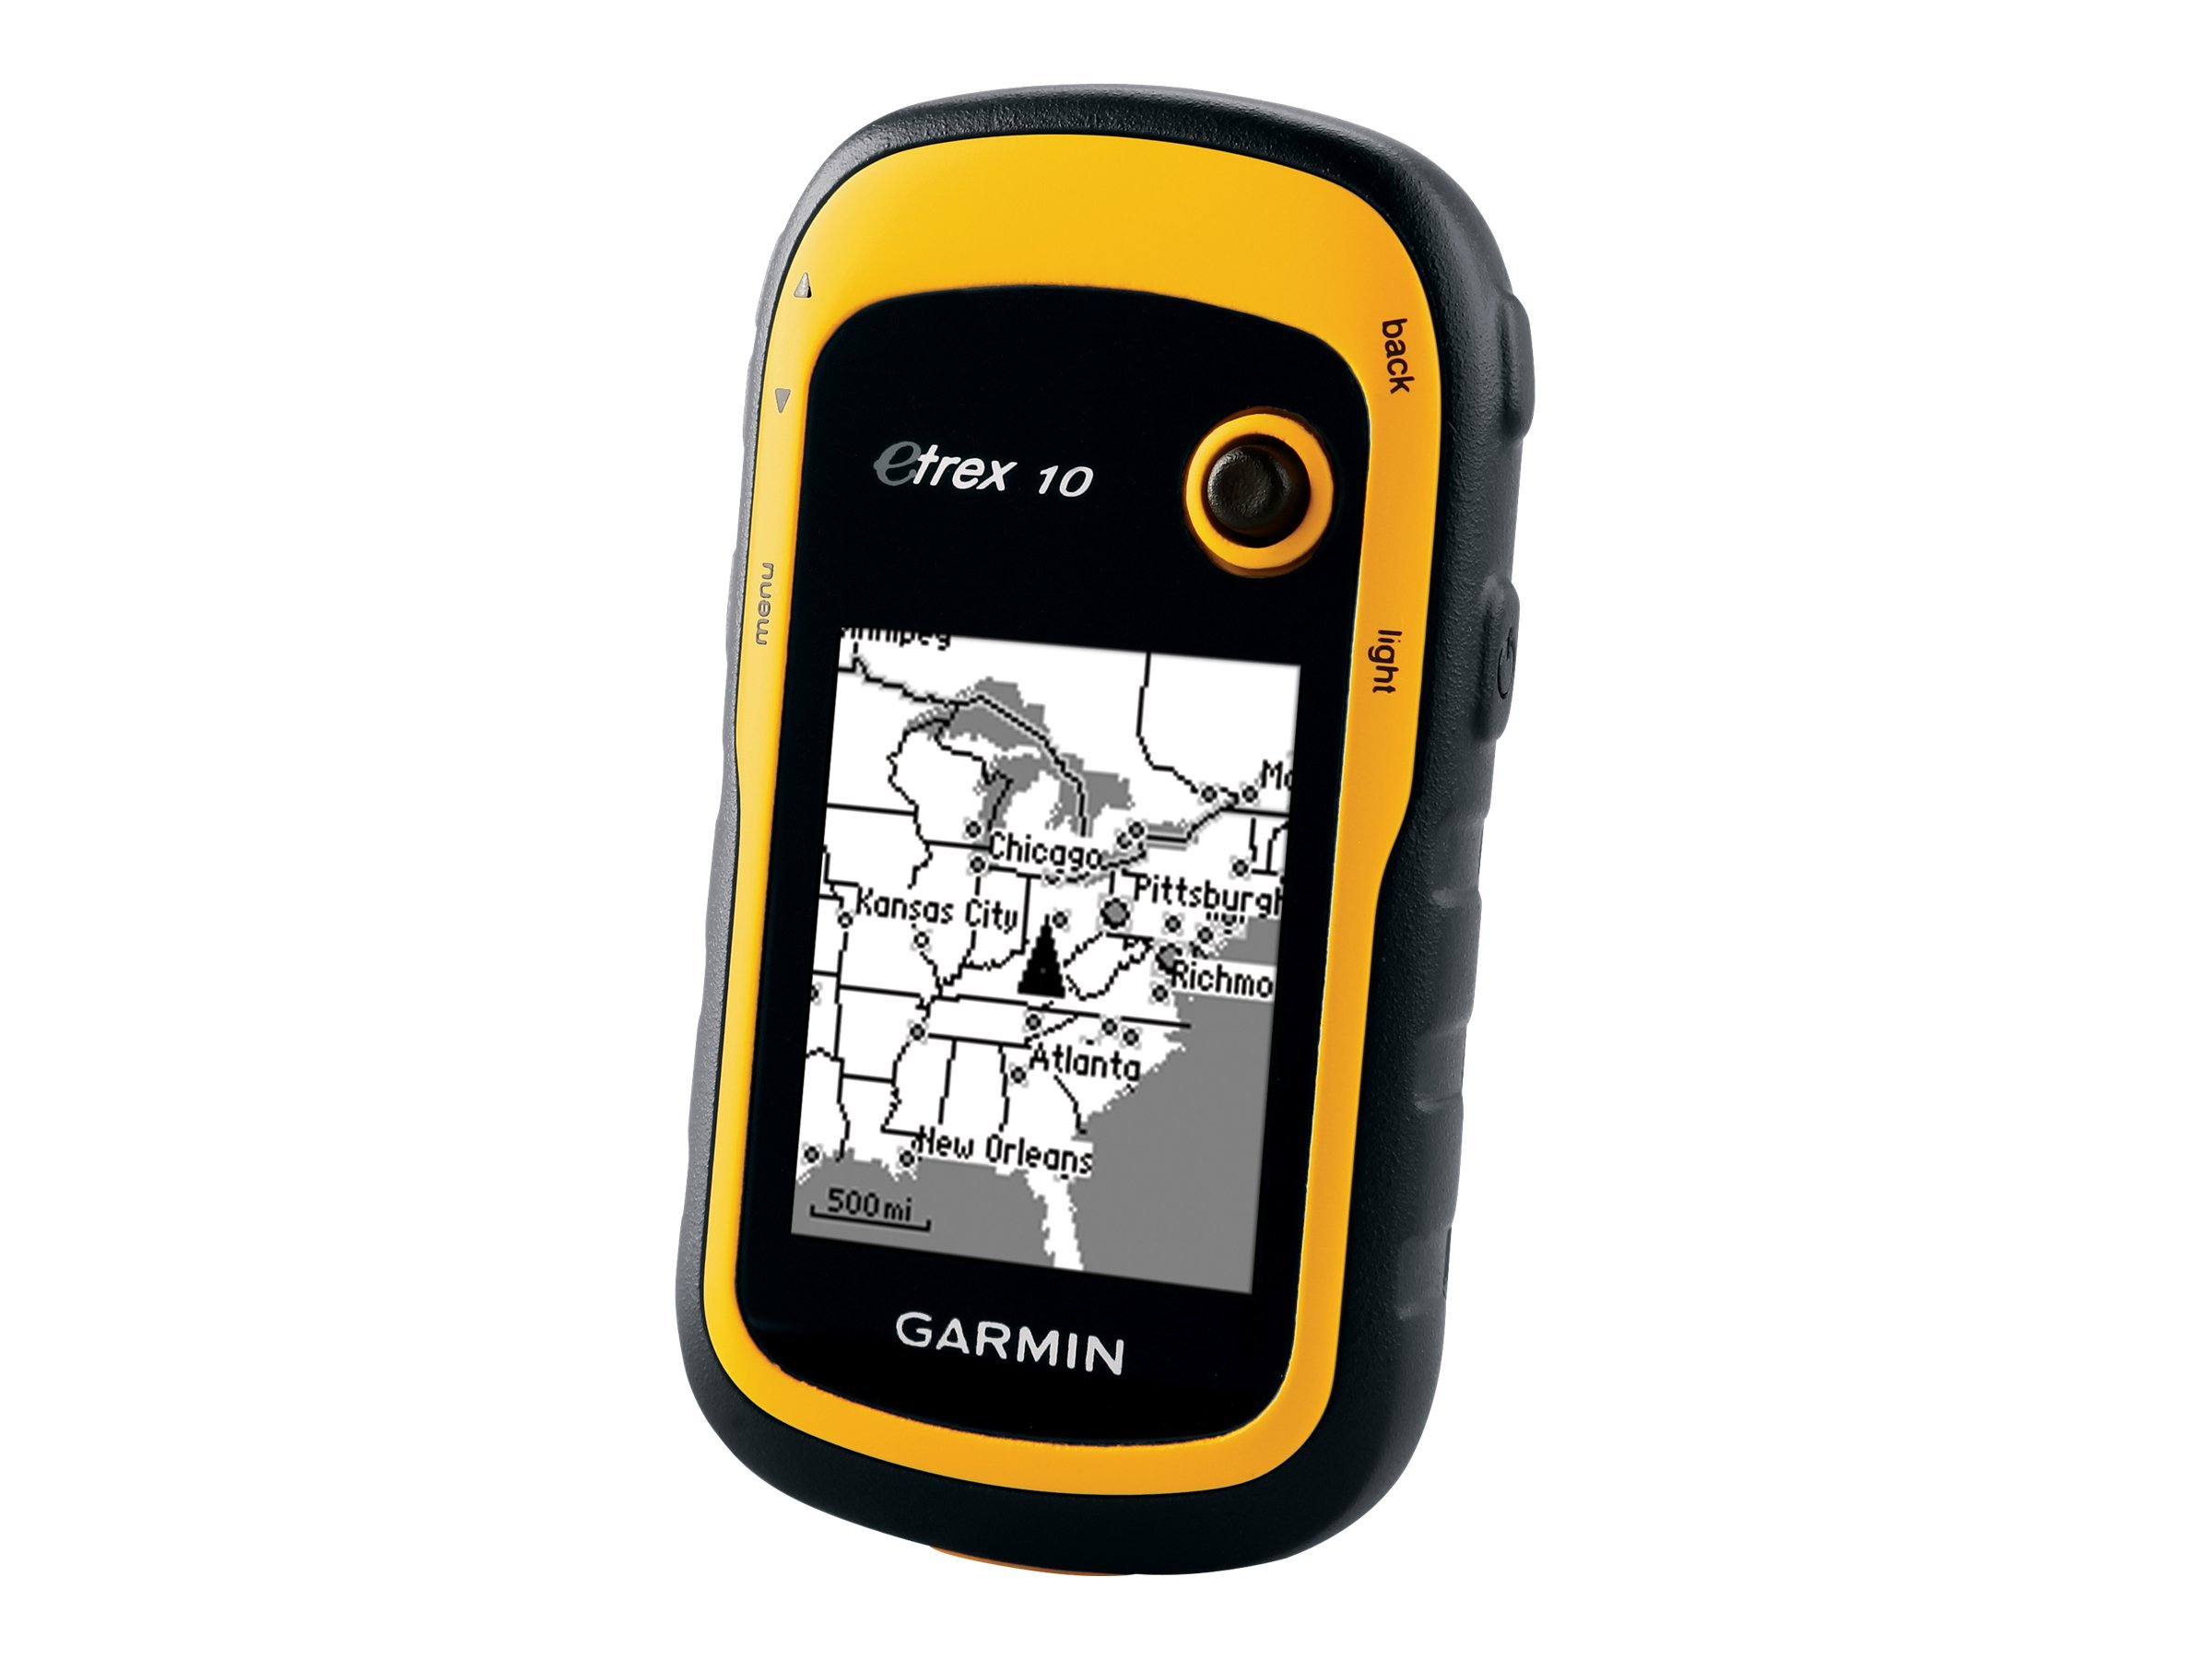 Garmin eTrex 10 - GPS-Navigationsger?t